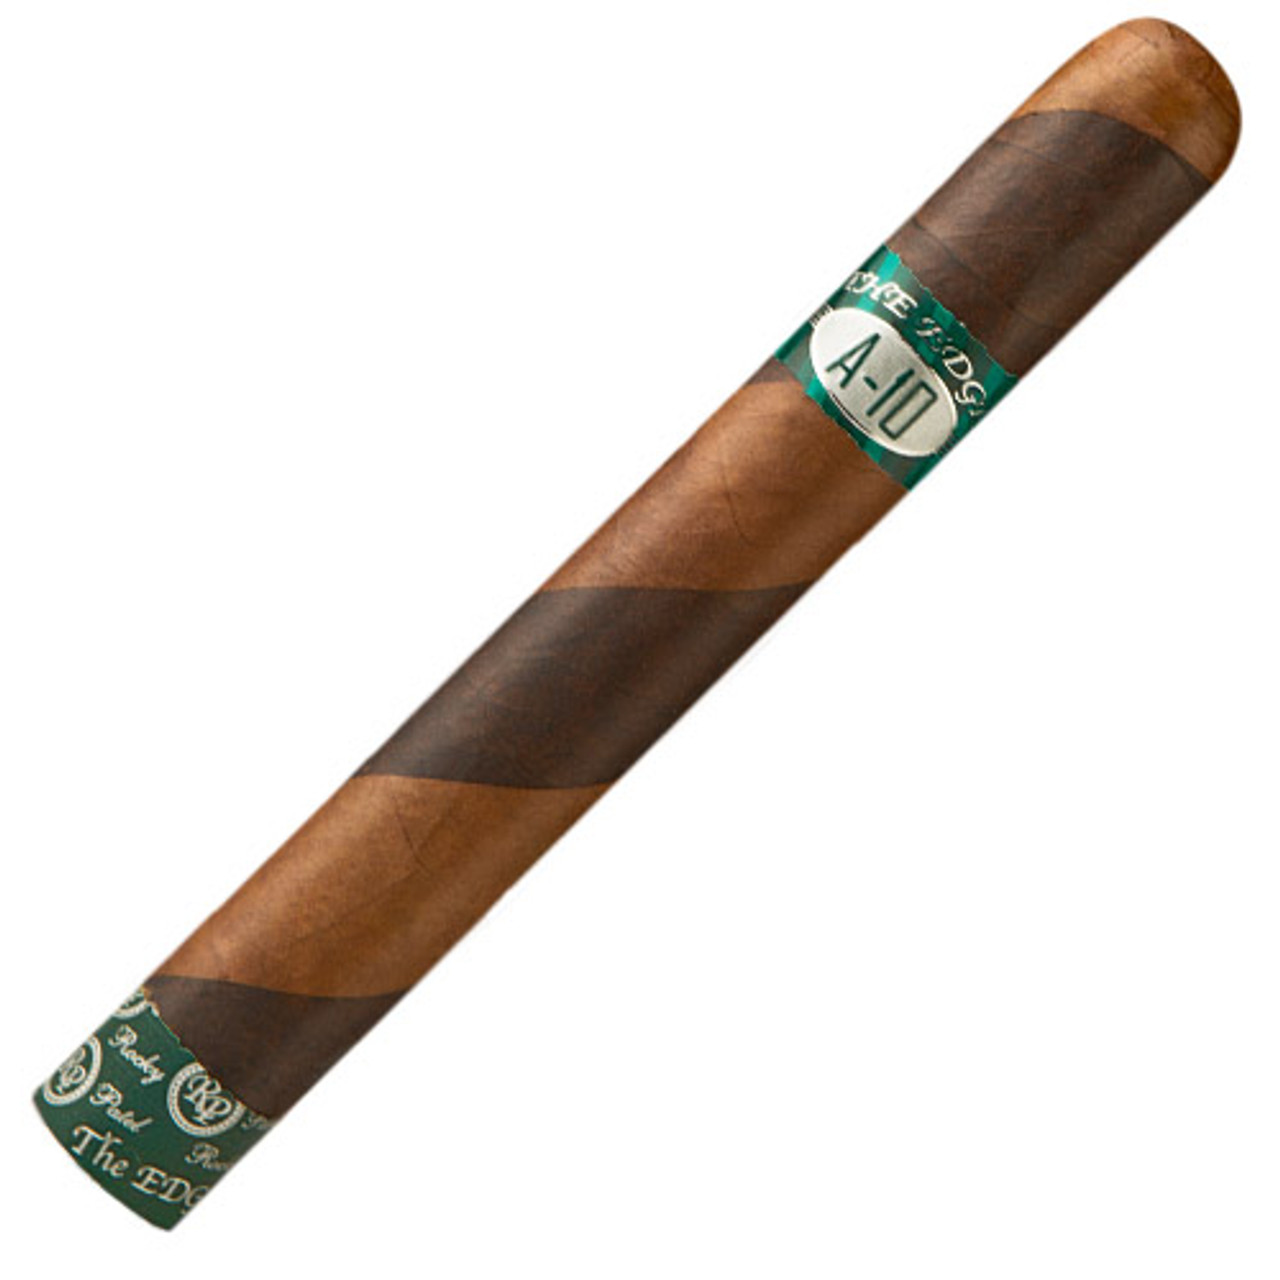 Rocky Patel The Edge A-10 Special Edition Toro Maduro Cigars - 6 x 52 (Box of 20)